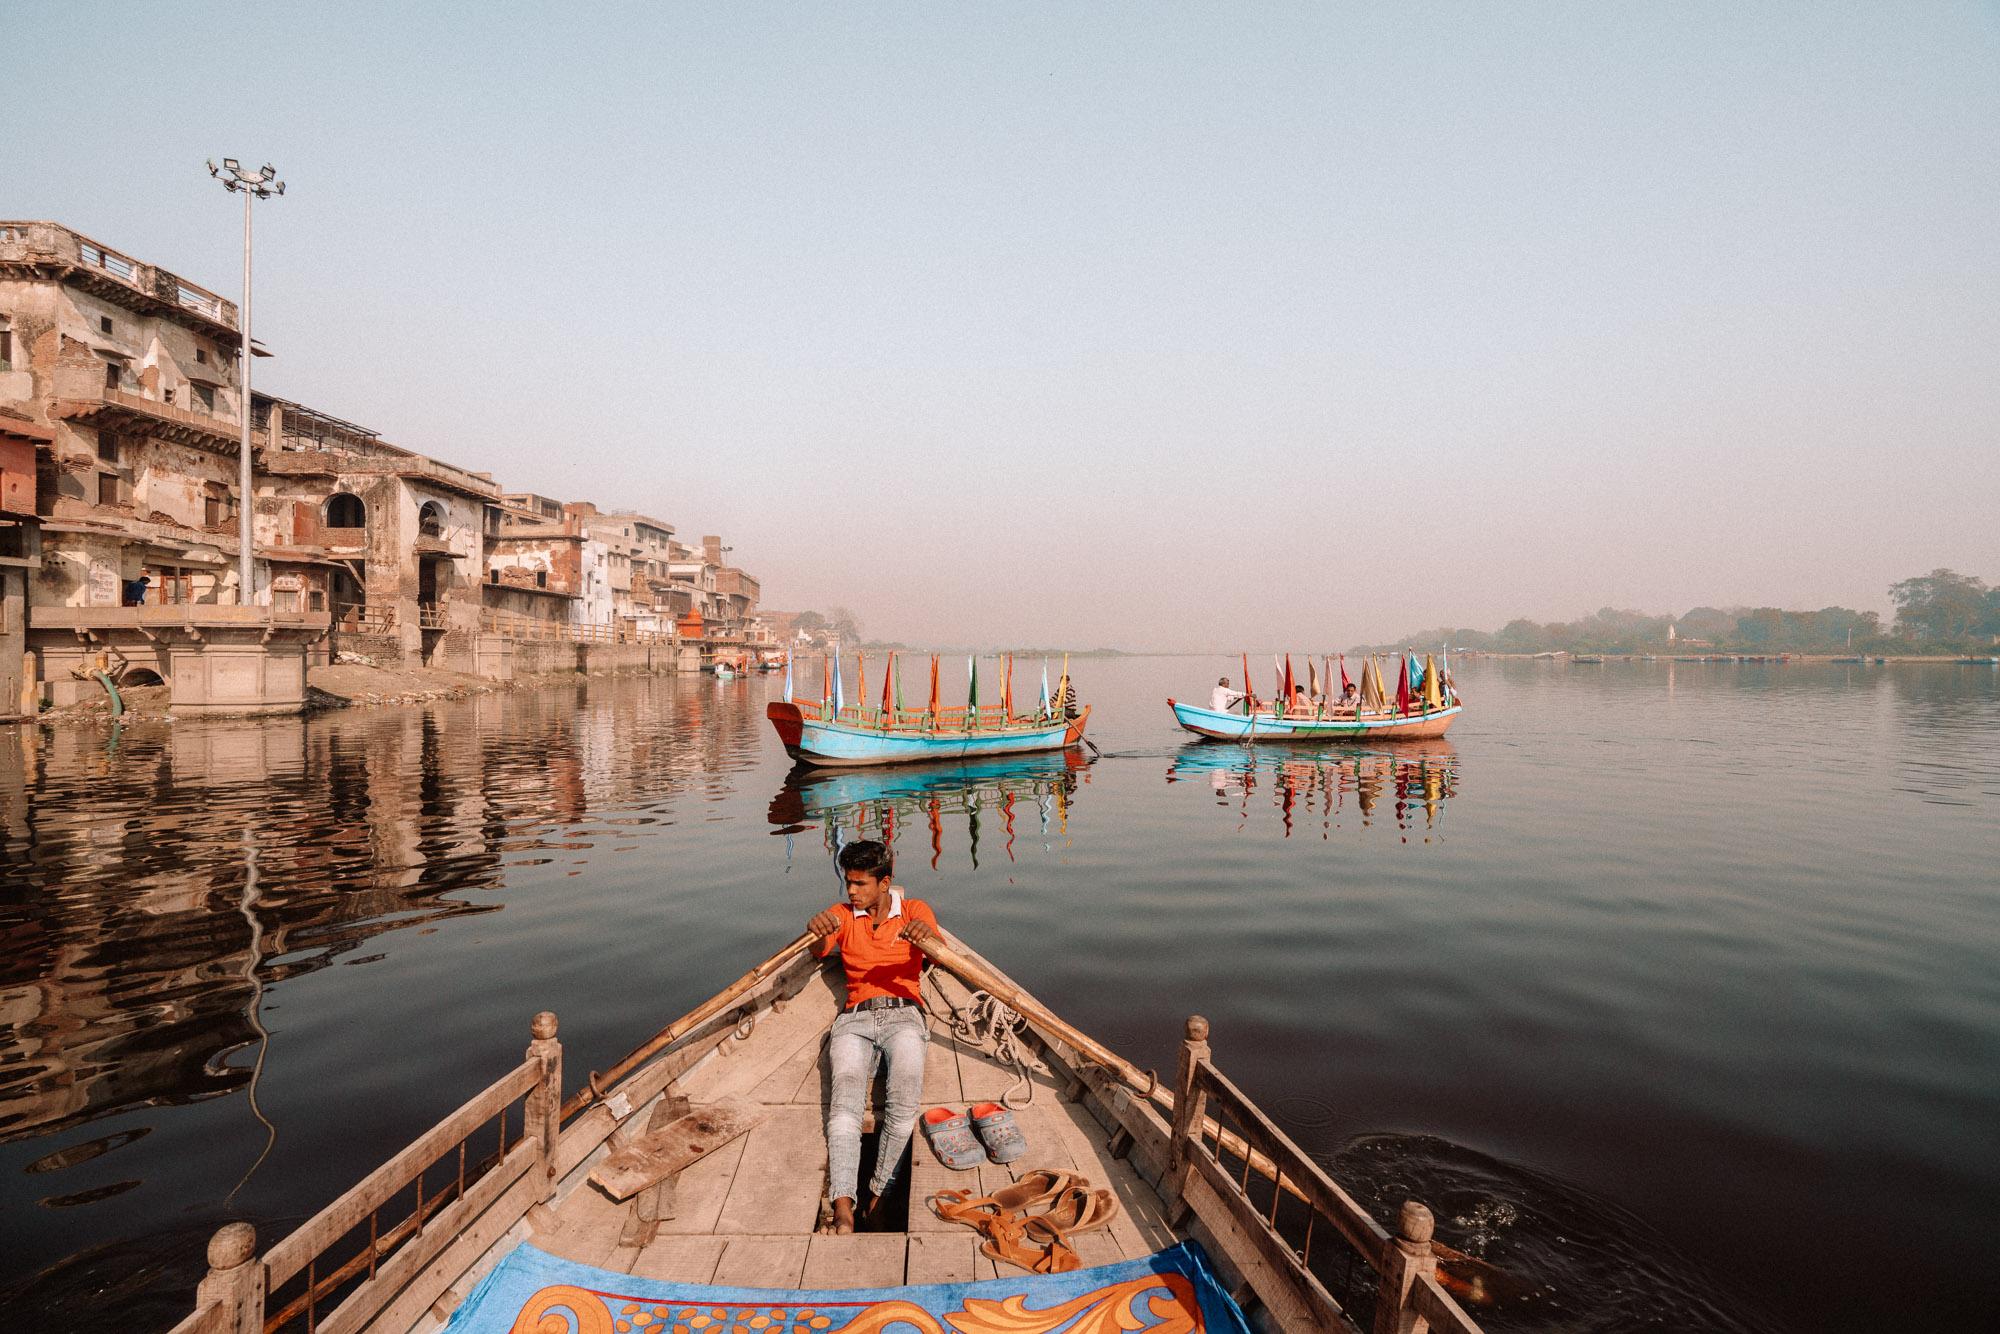 Man steering boat in Mathura, India via @finduslost